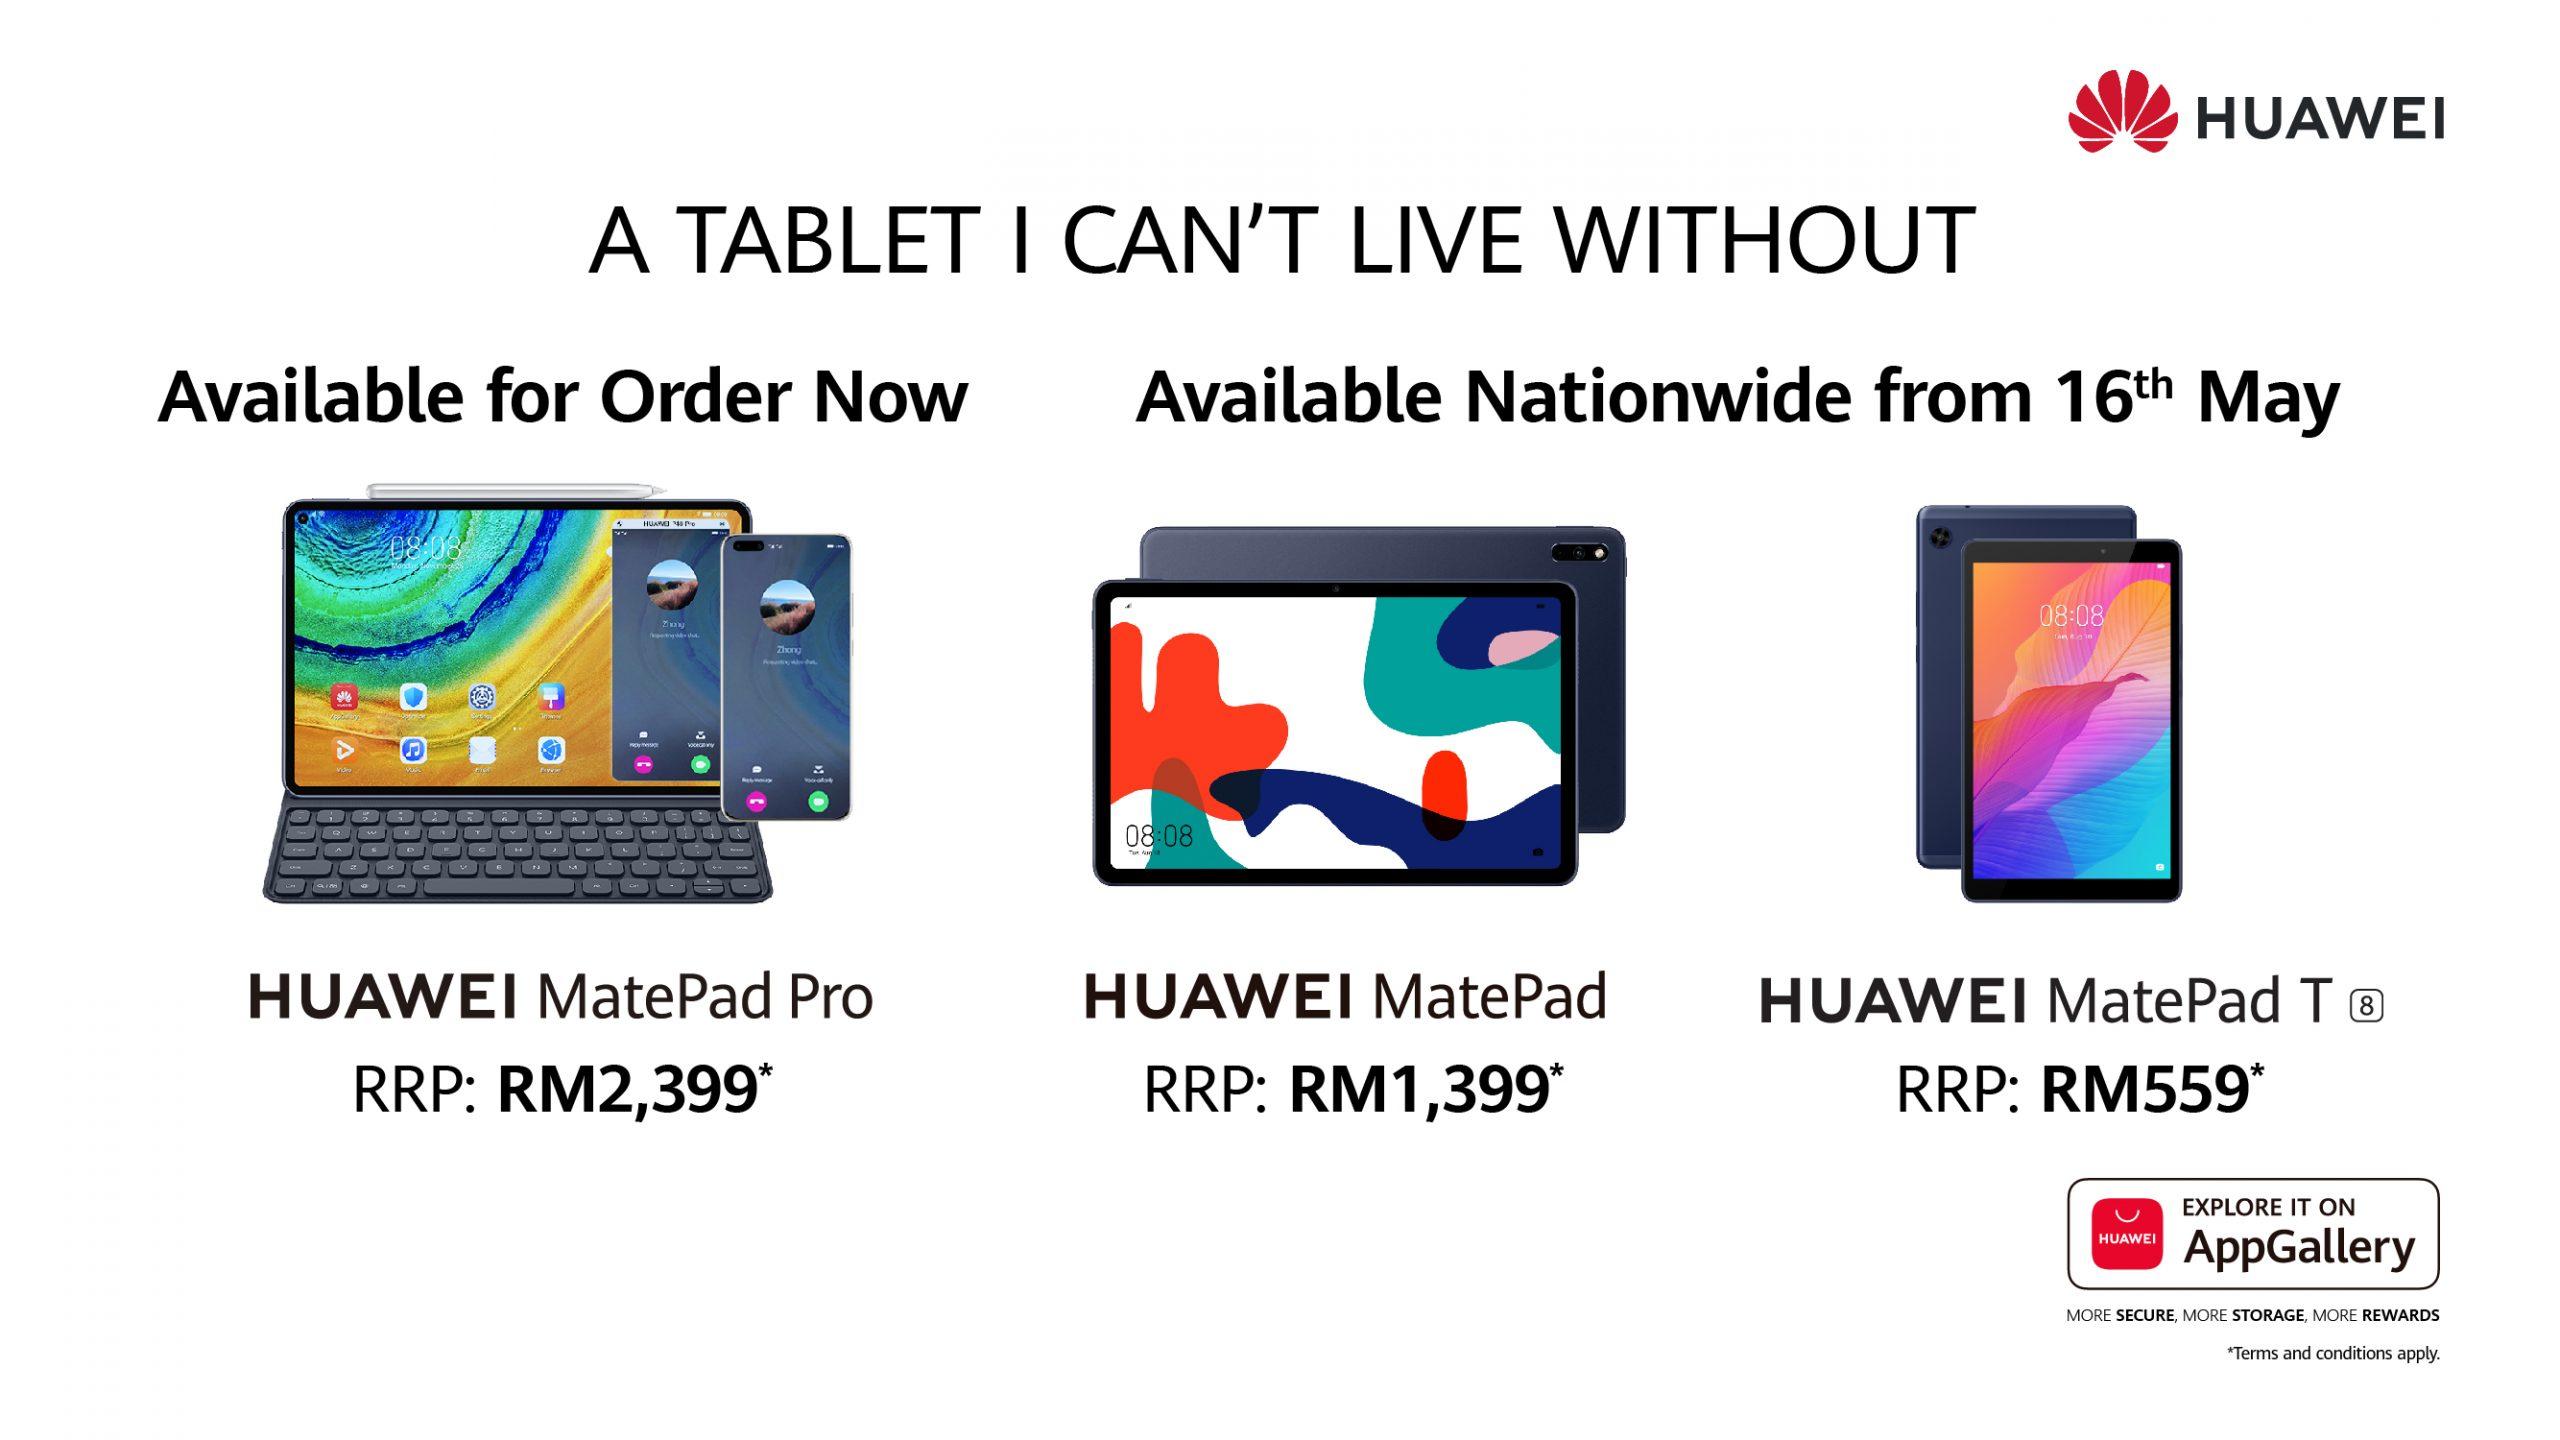 Huawei MatePad Series